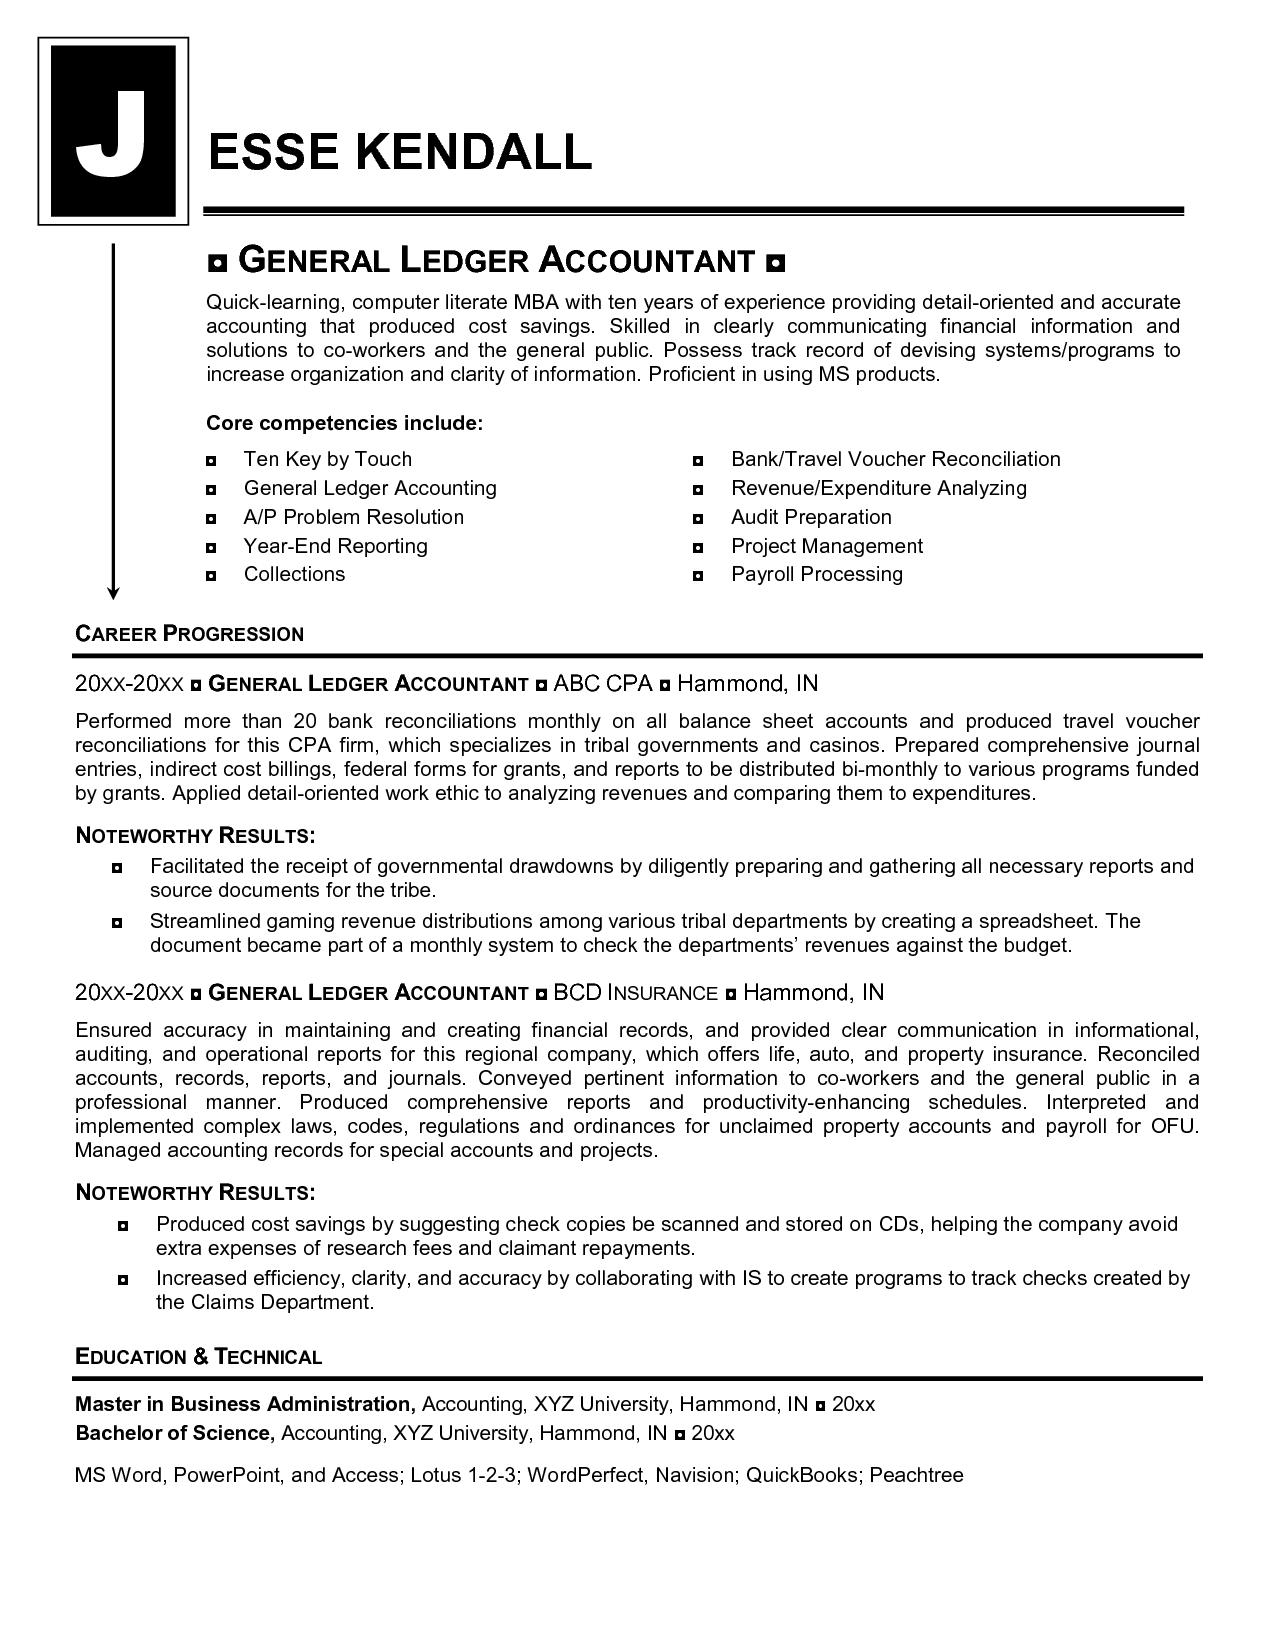 General ledger resume